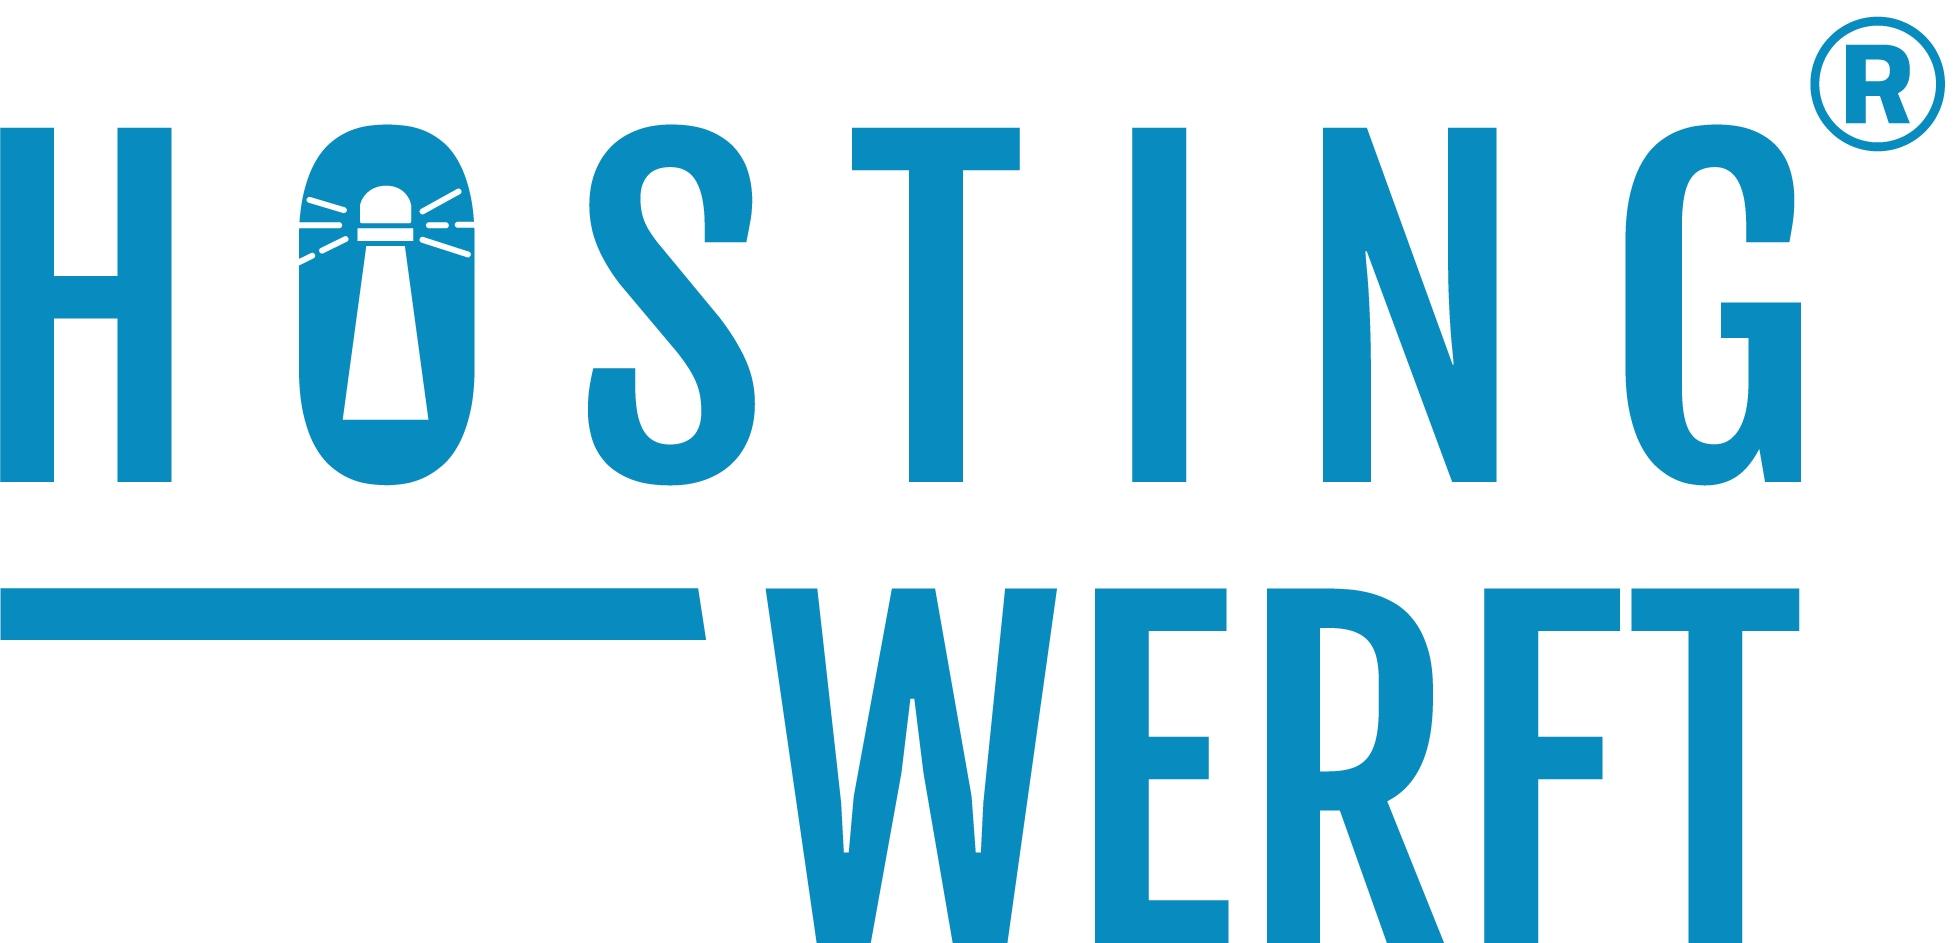 Hostingwerft.de – Highspeed WordPress & Shopware Hosting